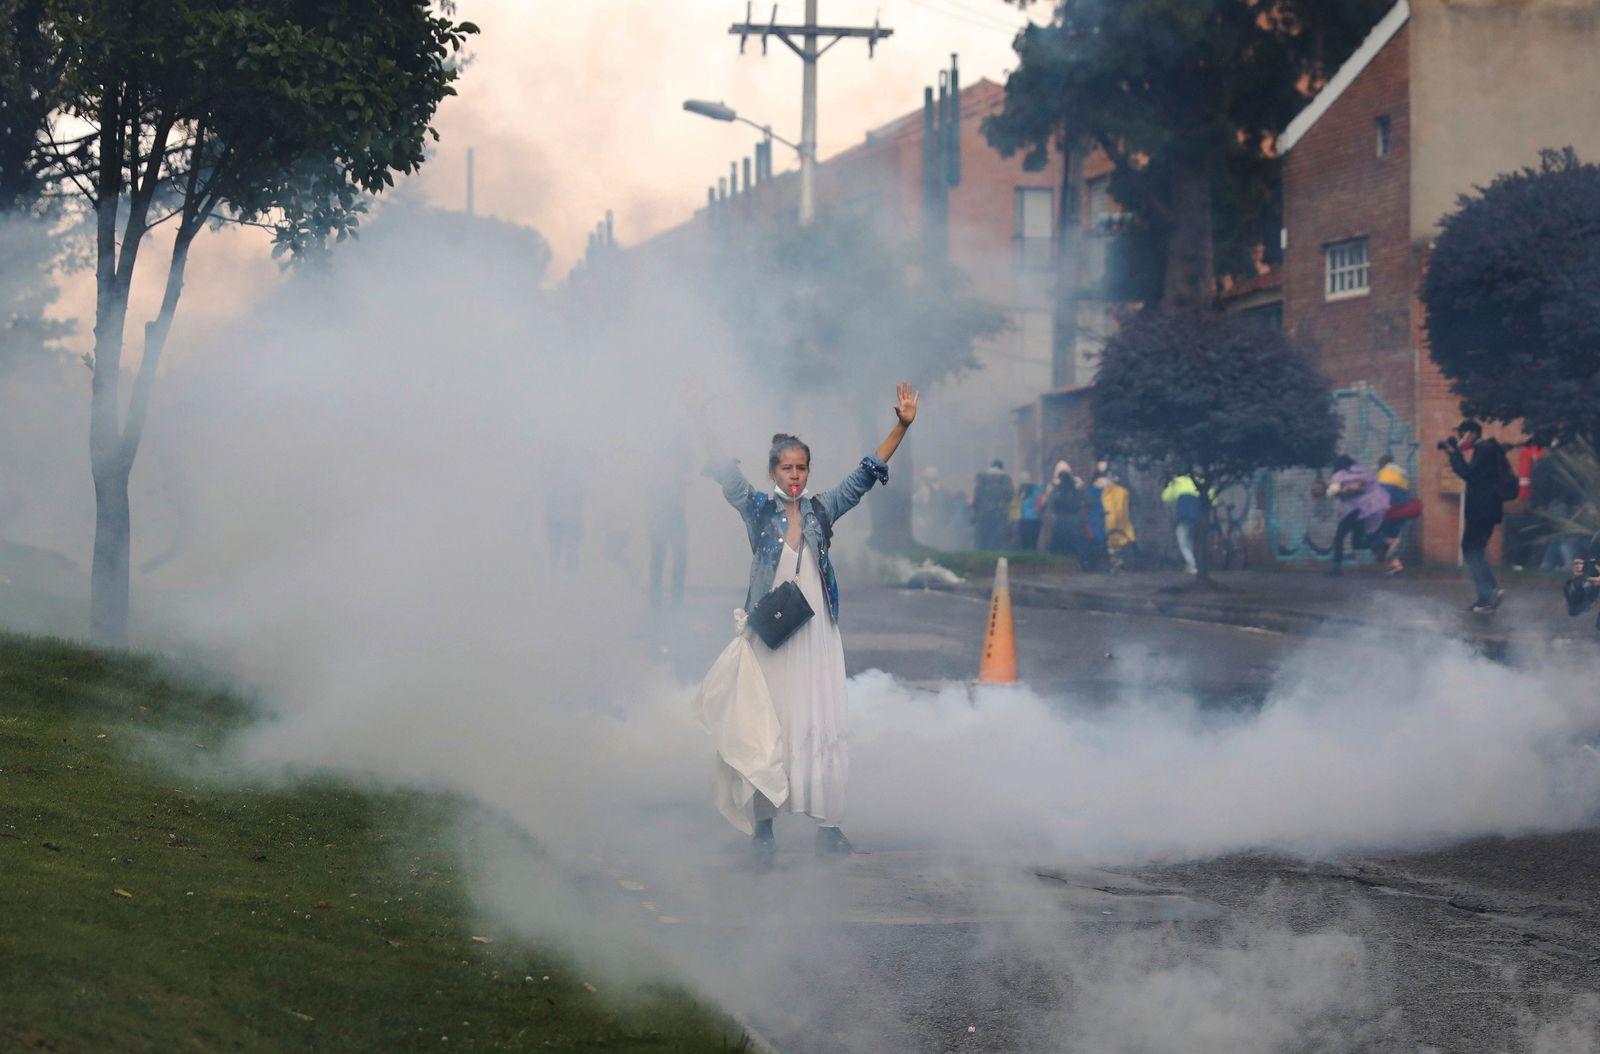 1. Mai - Demonstrationen - Bogota